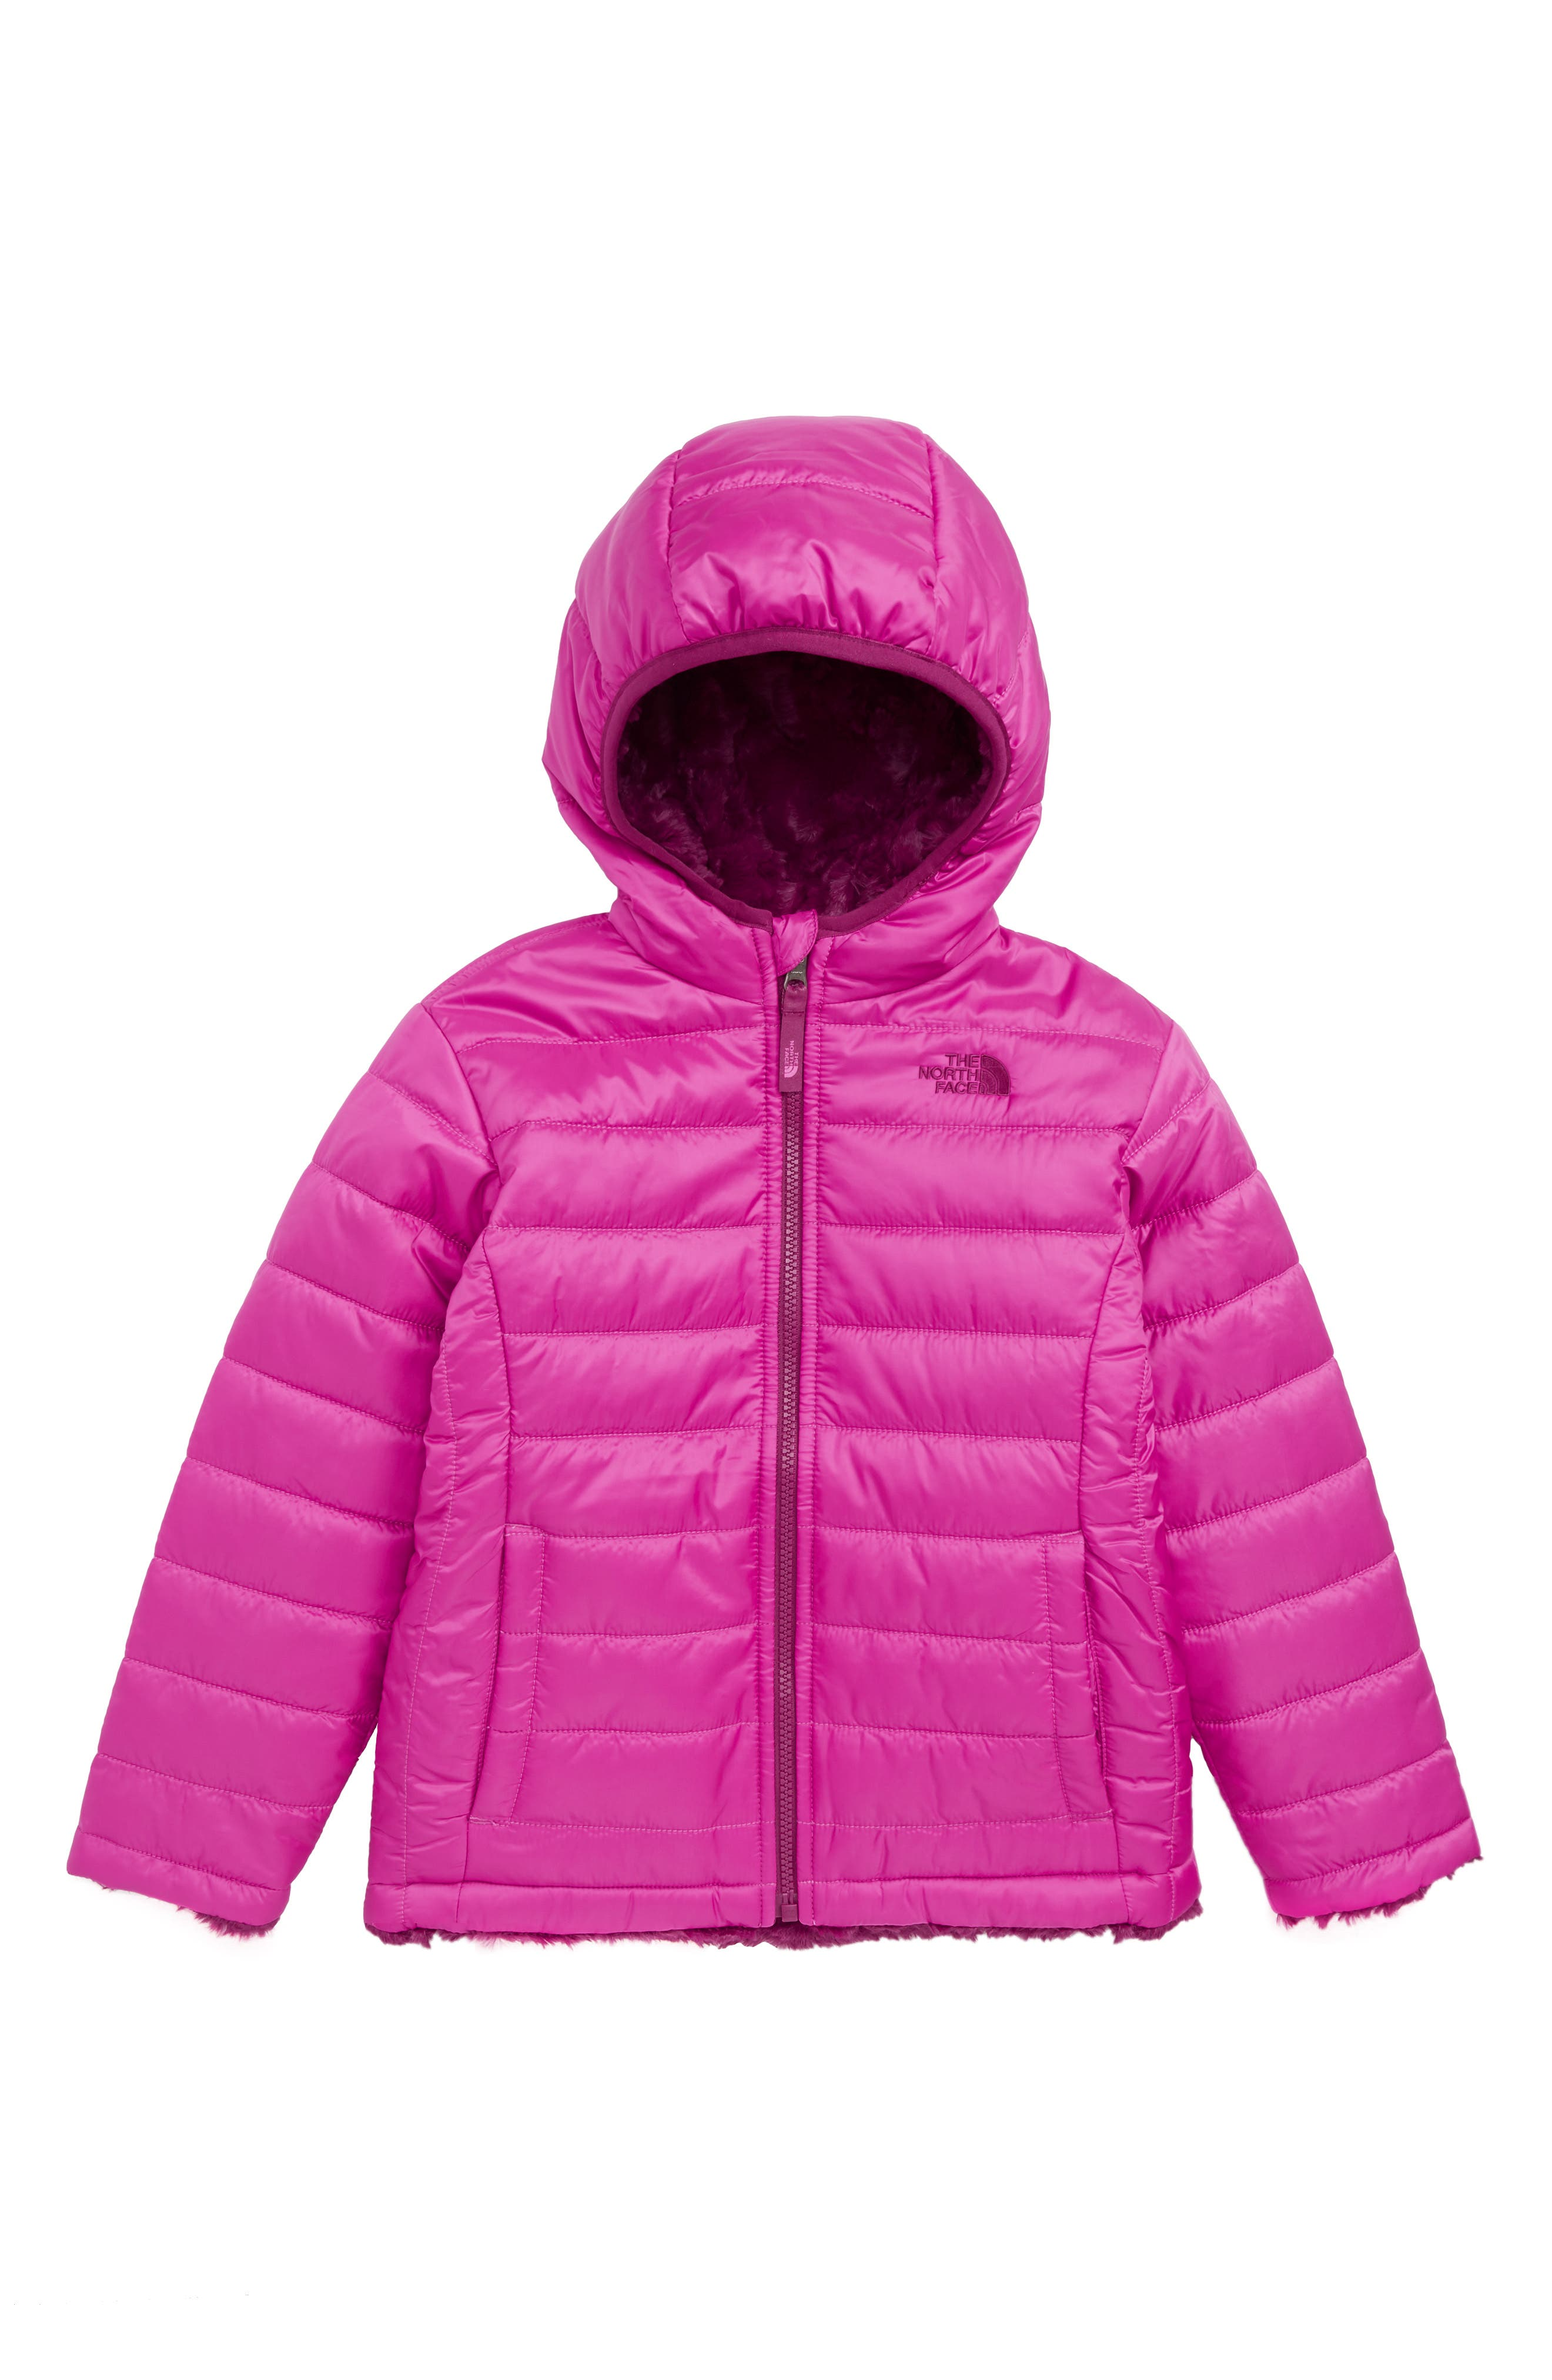 Mossbud Swirl Insulated Reversible Jacket,                             Main thumbnail 1, color,                             AZALEA PINK/ DRAMATIC PLUM